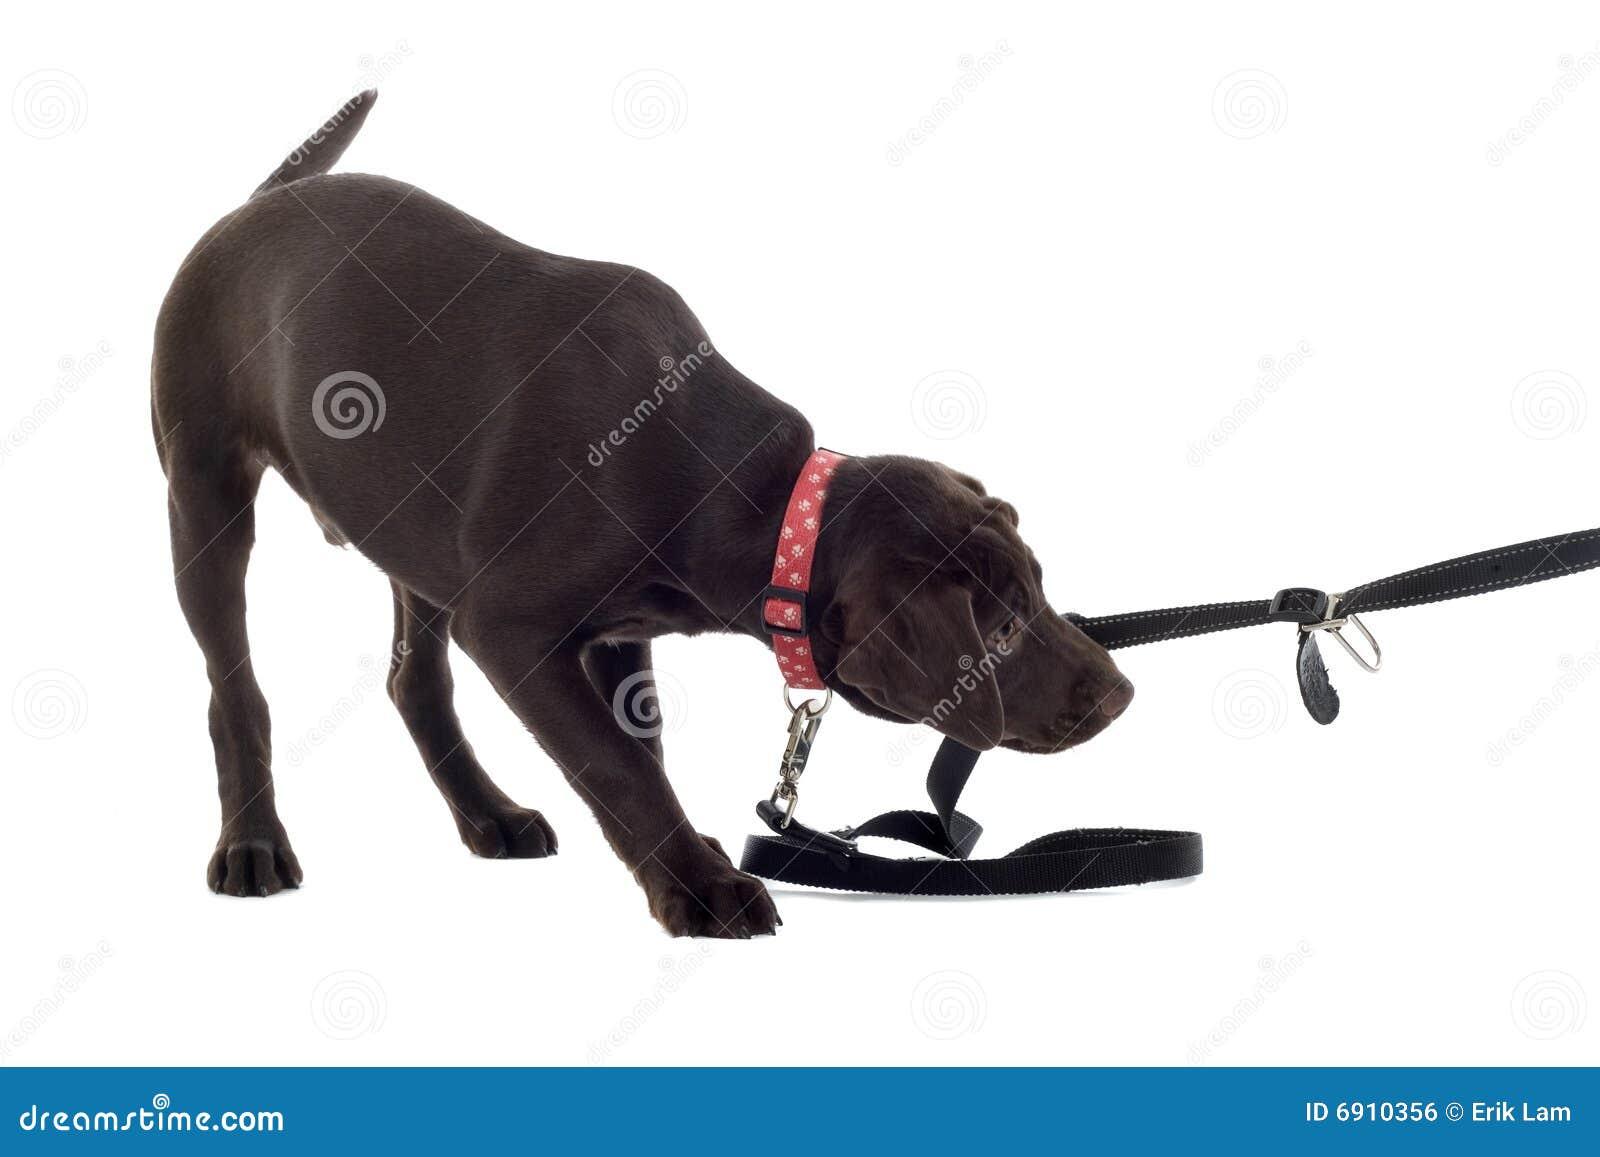 Chocolate Labrador Pup